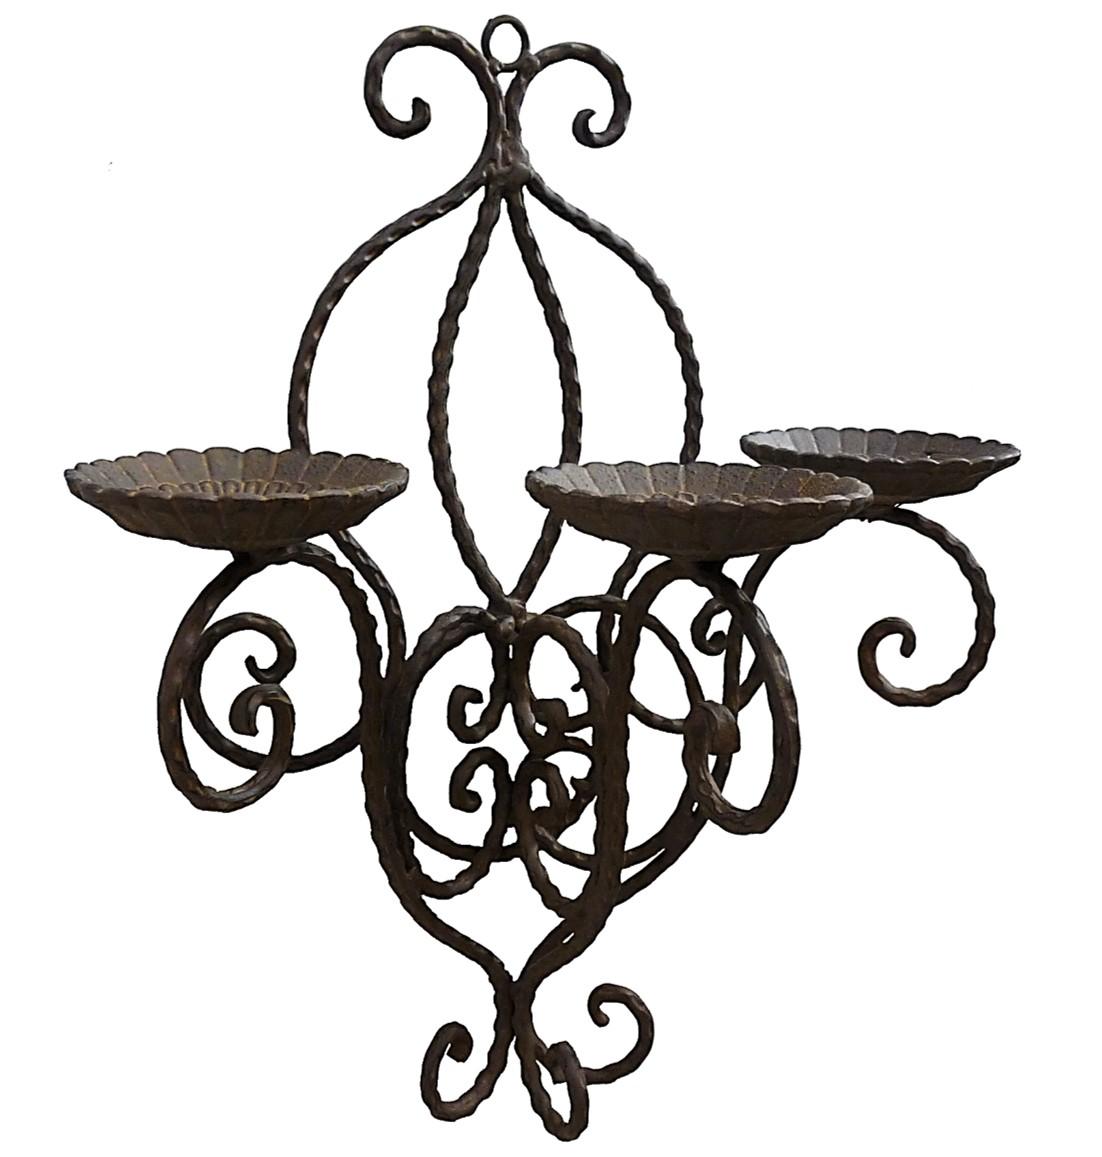 Applique bougeoir chandelier mural en fer forge a bougie - Bougeoir mural fer forge ...